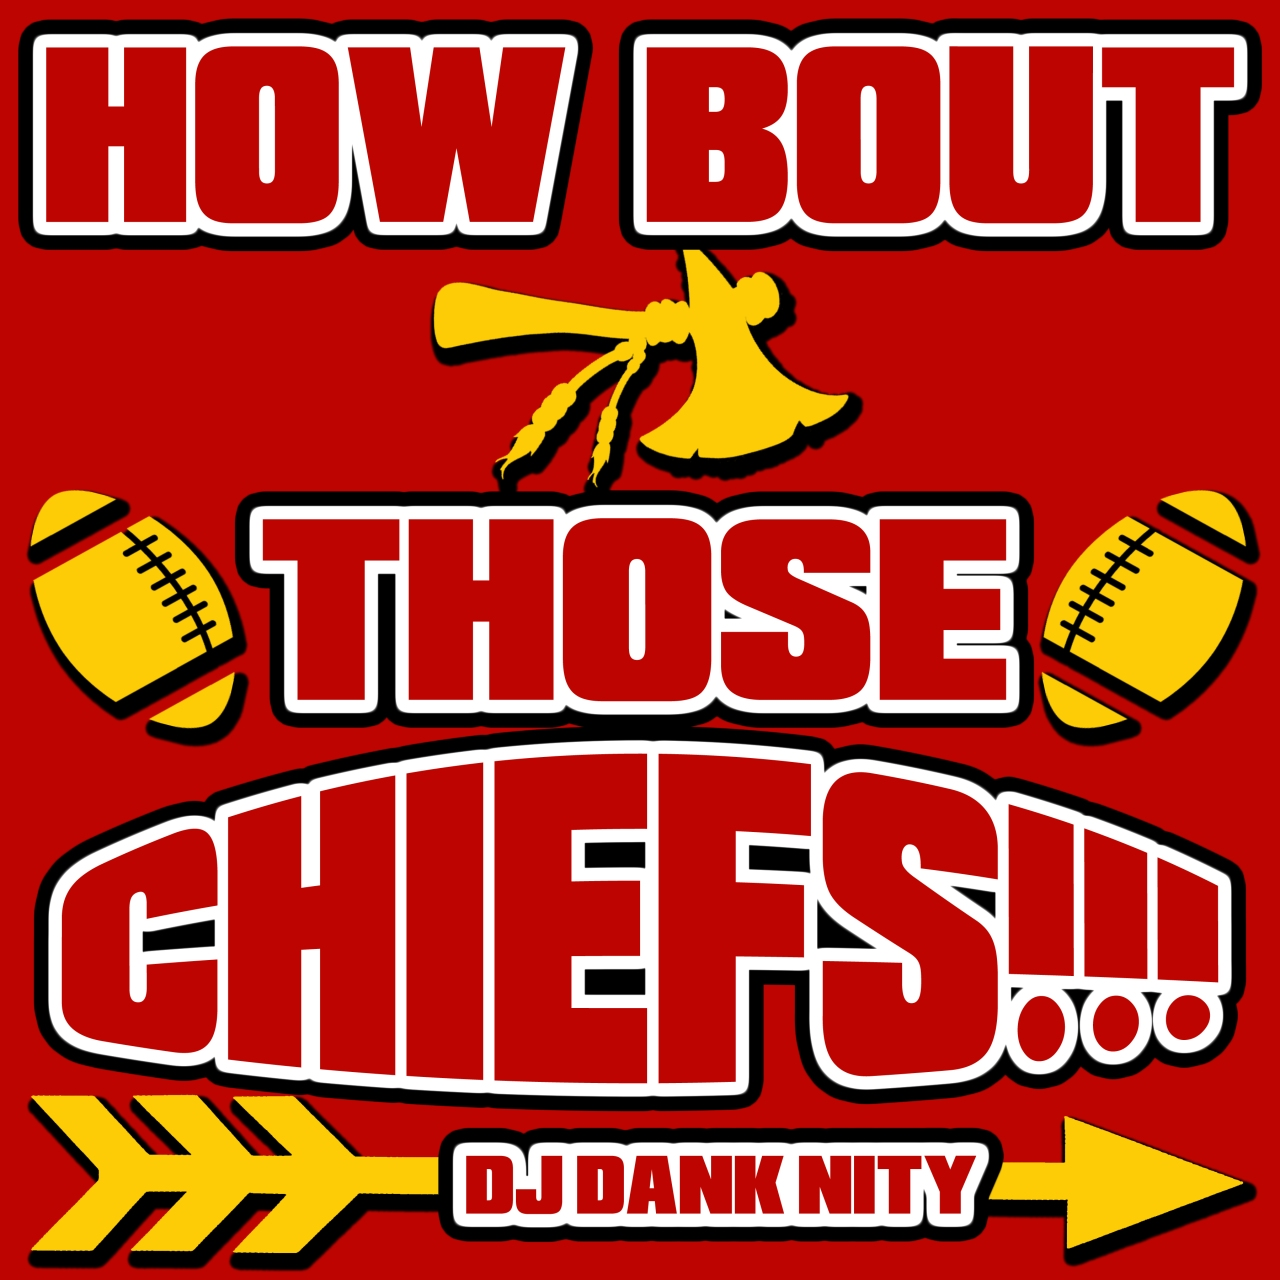 DJ Dank Nity – How Bout Those ChiefsTheme